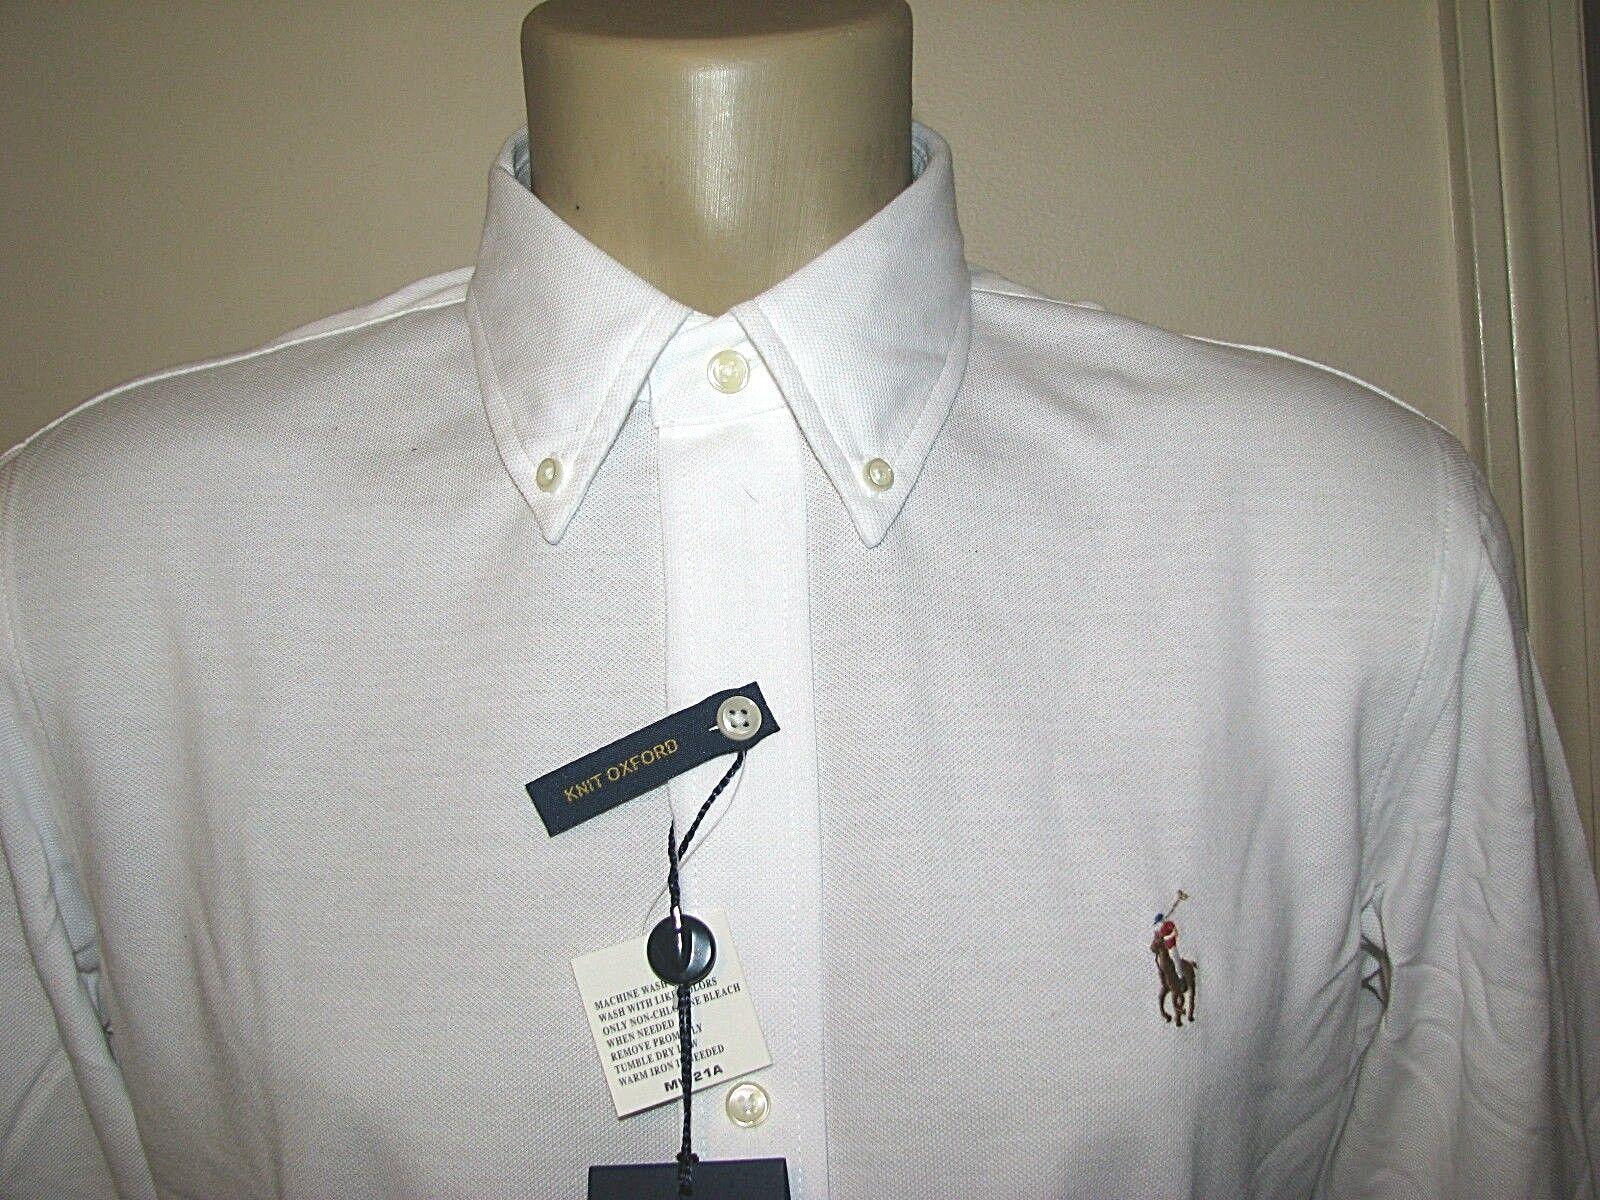 Men's  (XL) POLO-RALPH LAUREN White Knit Pique Oxford Shirt